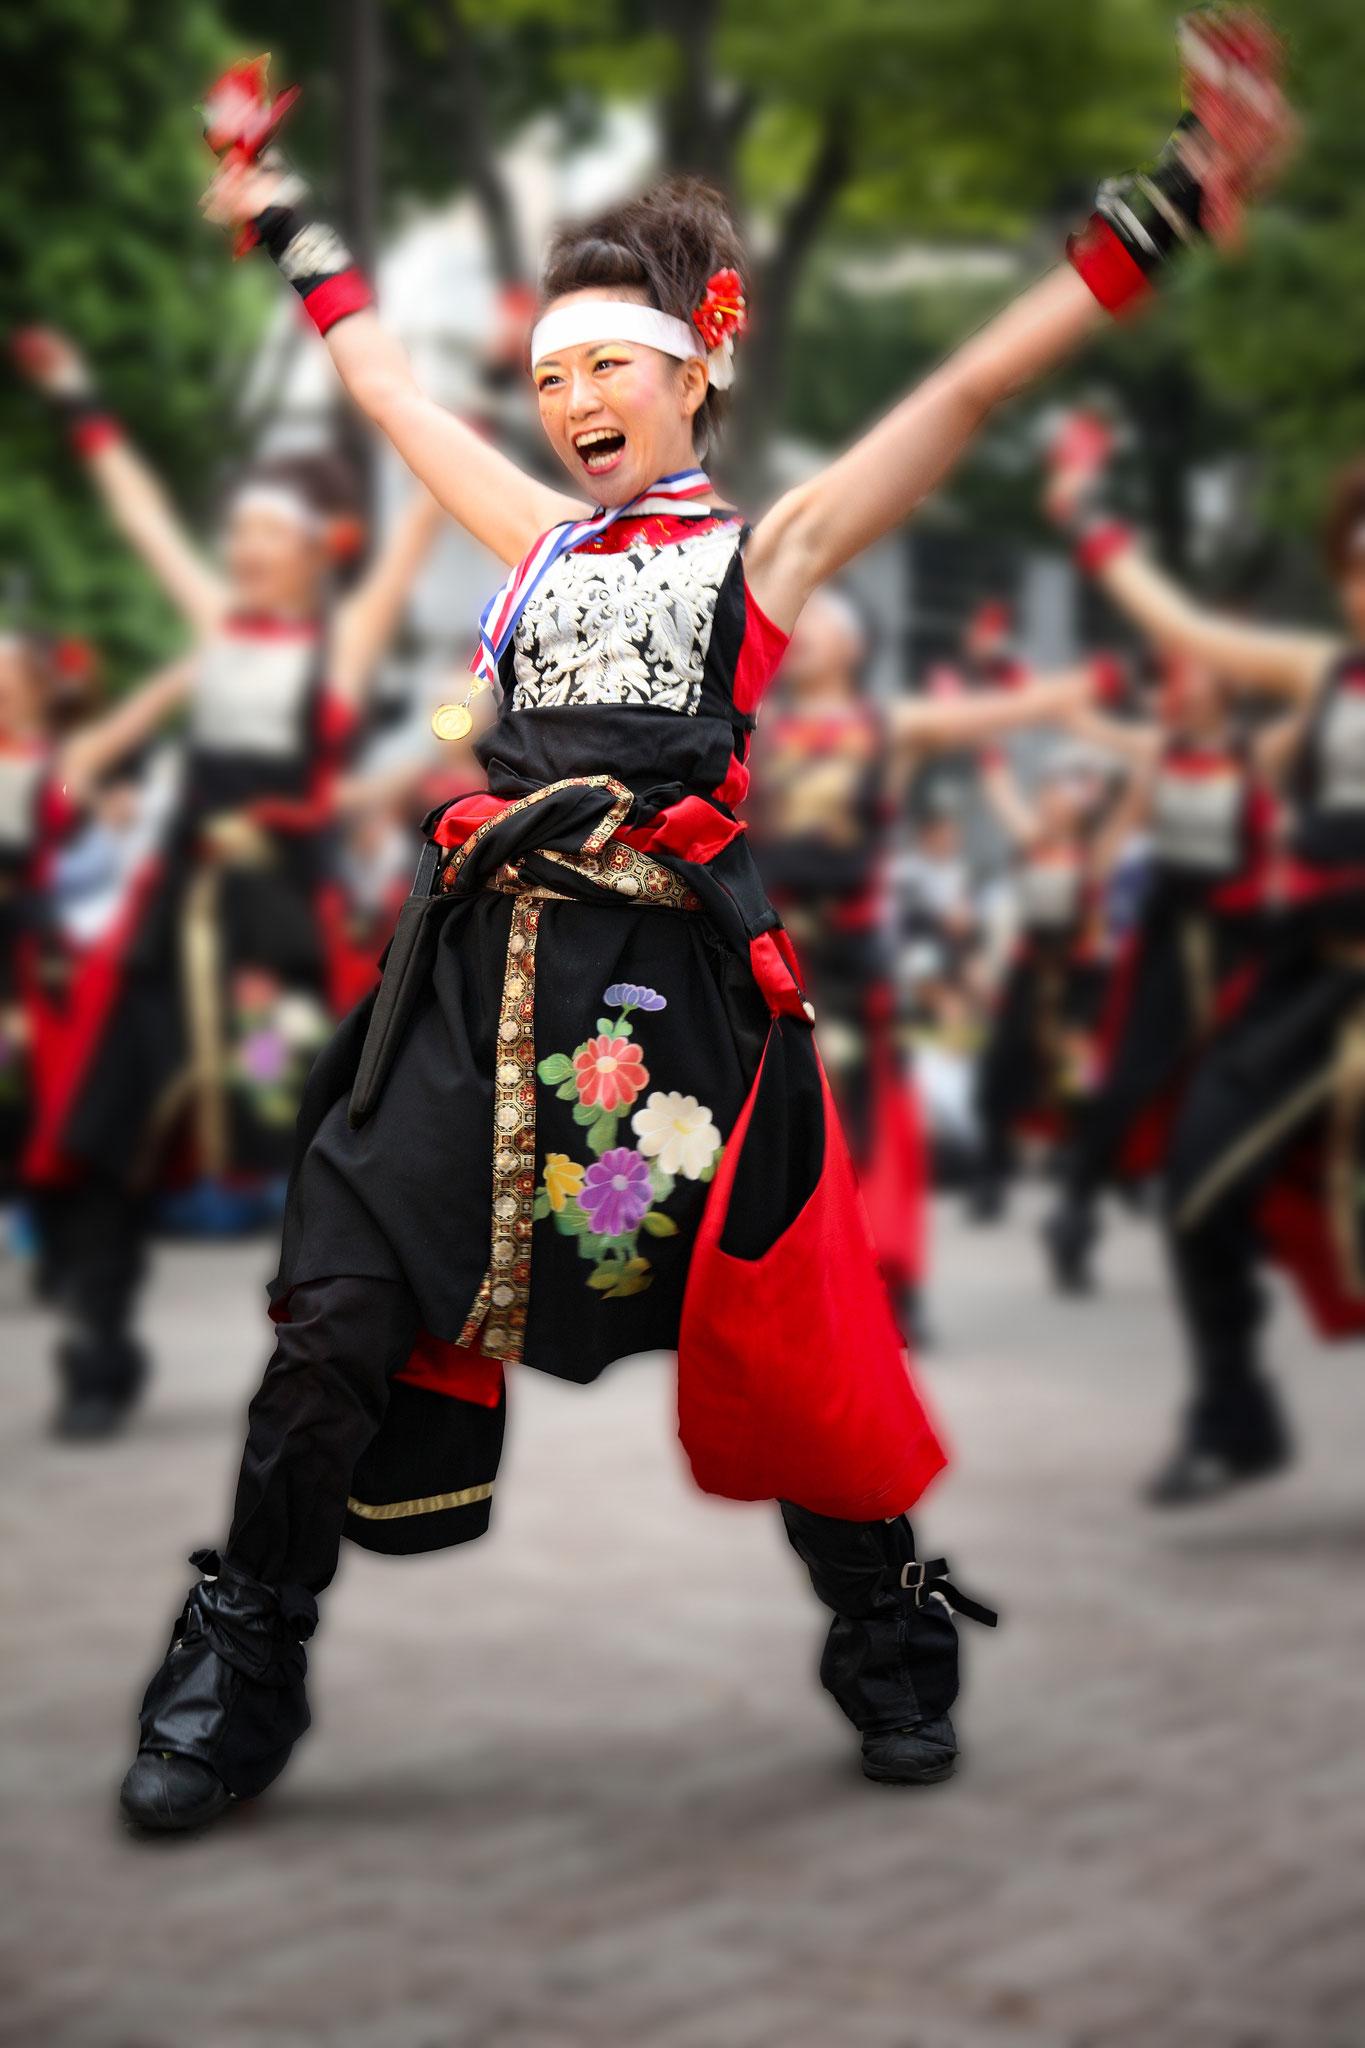 Chigira Keiko  (Japan) - Enthusiastic performance